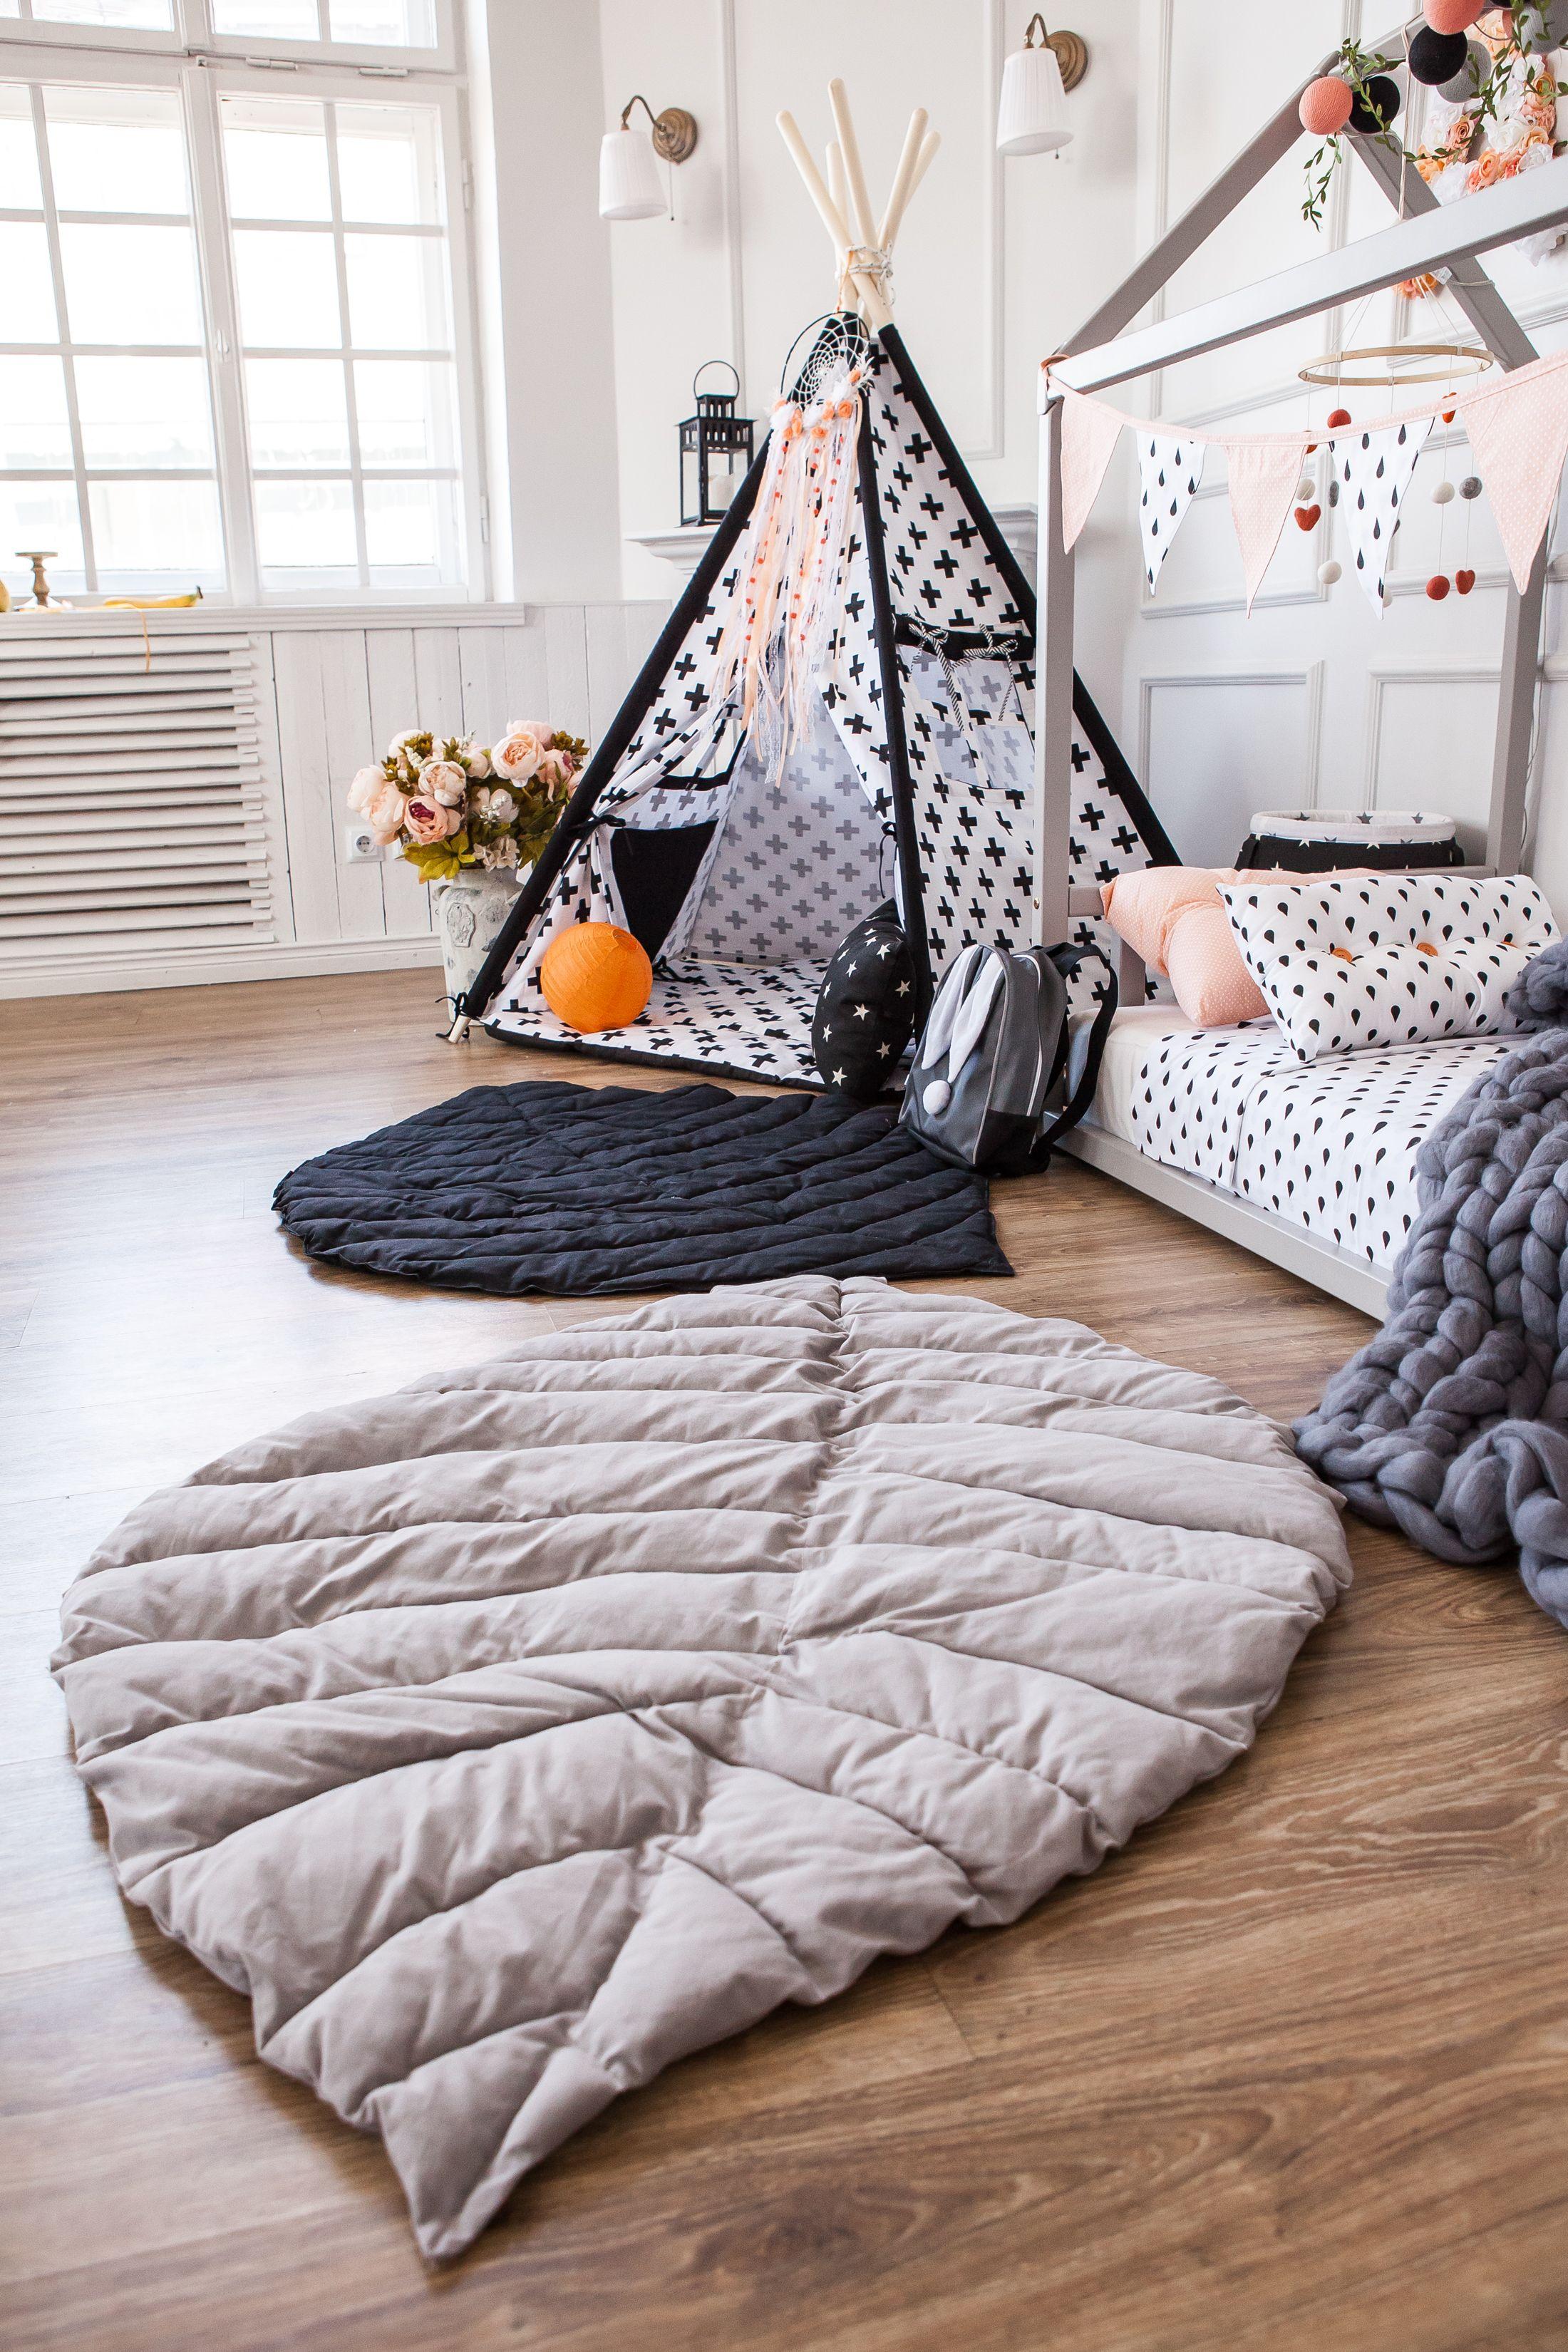 Baby Play Mat Floor Mat Bed Cover Nursery Carpet с